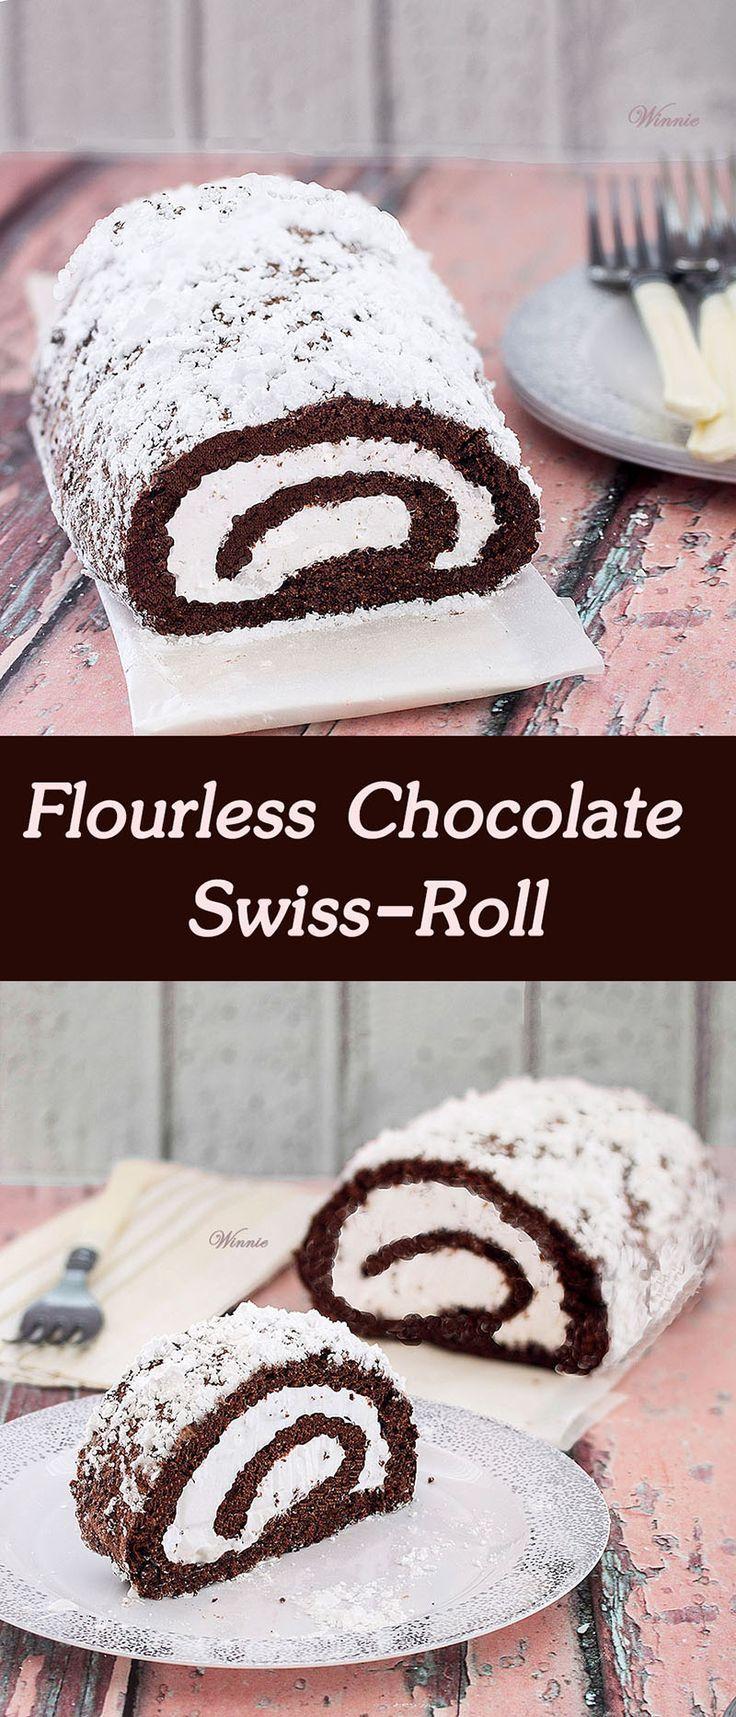 Flourless Chocolate Swiss-Roll - Gluten free | Recipe | Gluten free ...